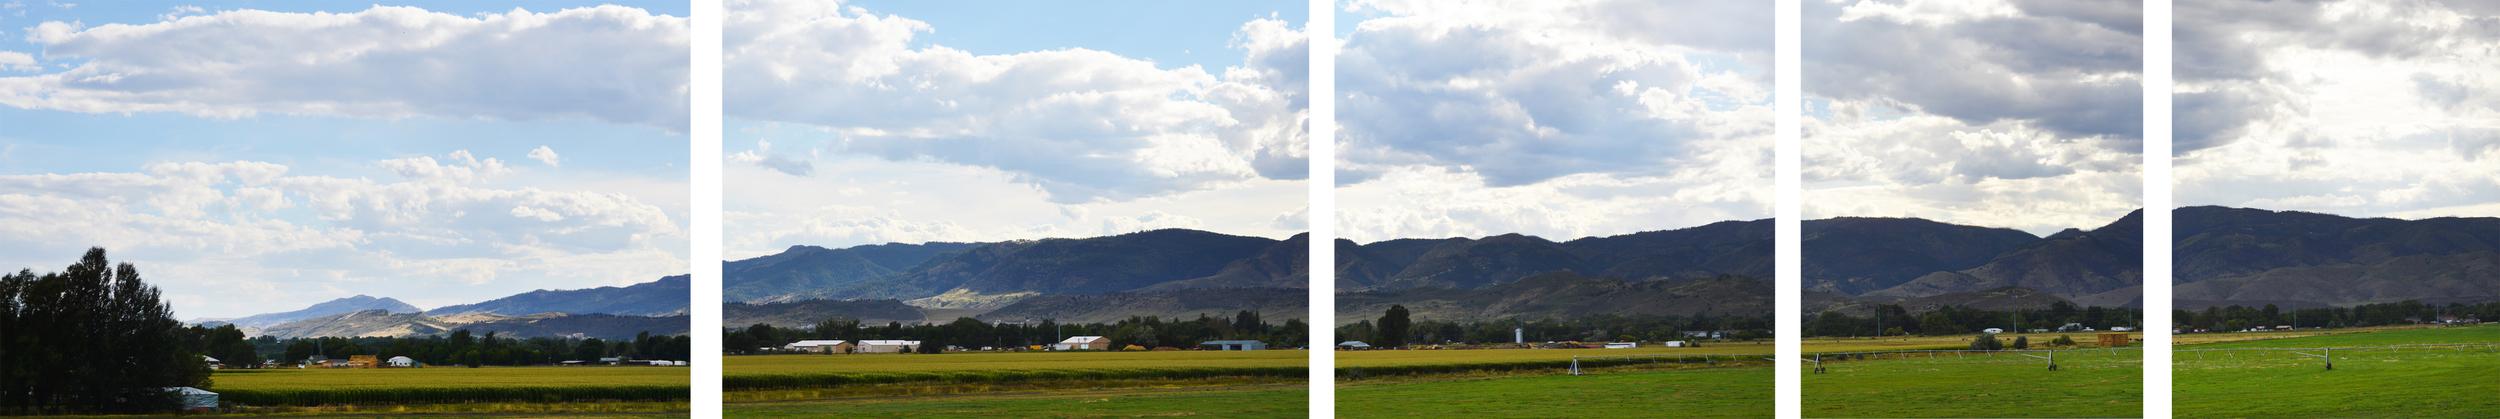 poudre-valley-community-farms.jpg